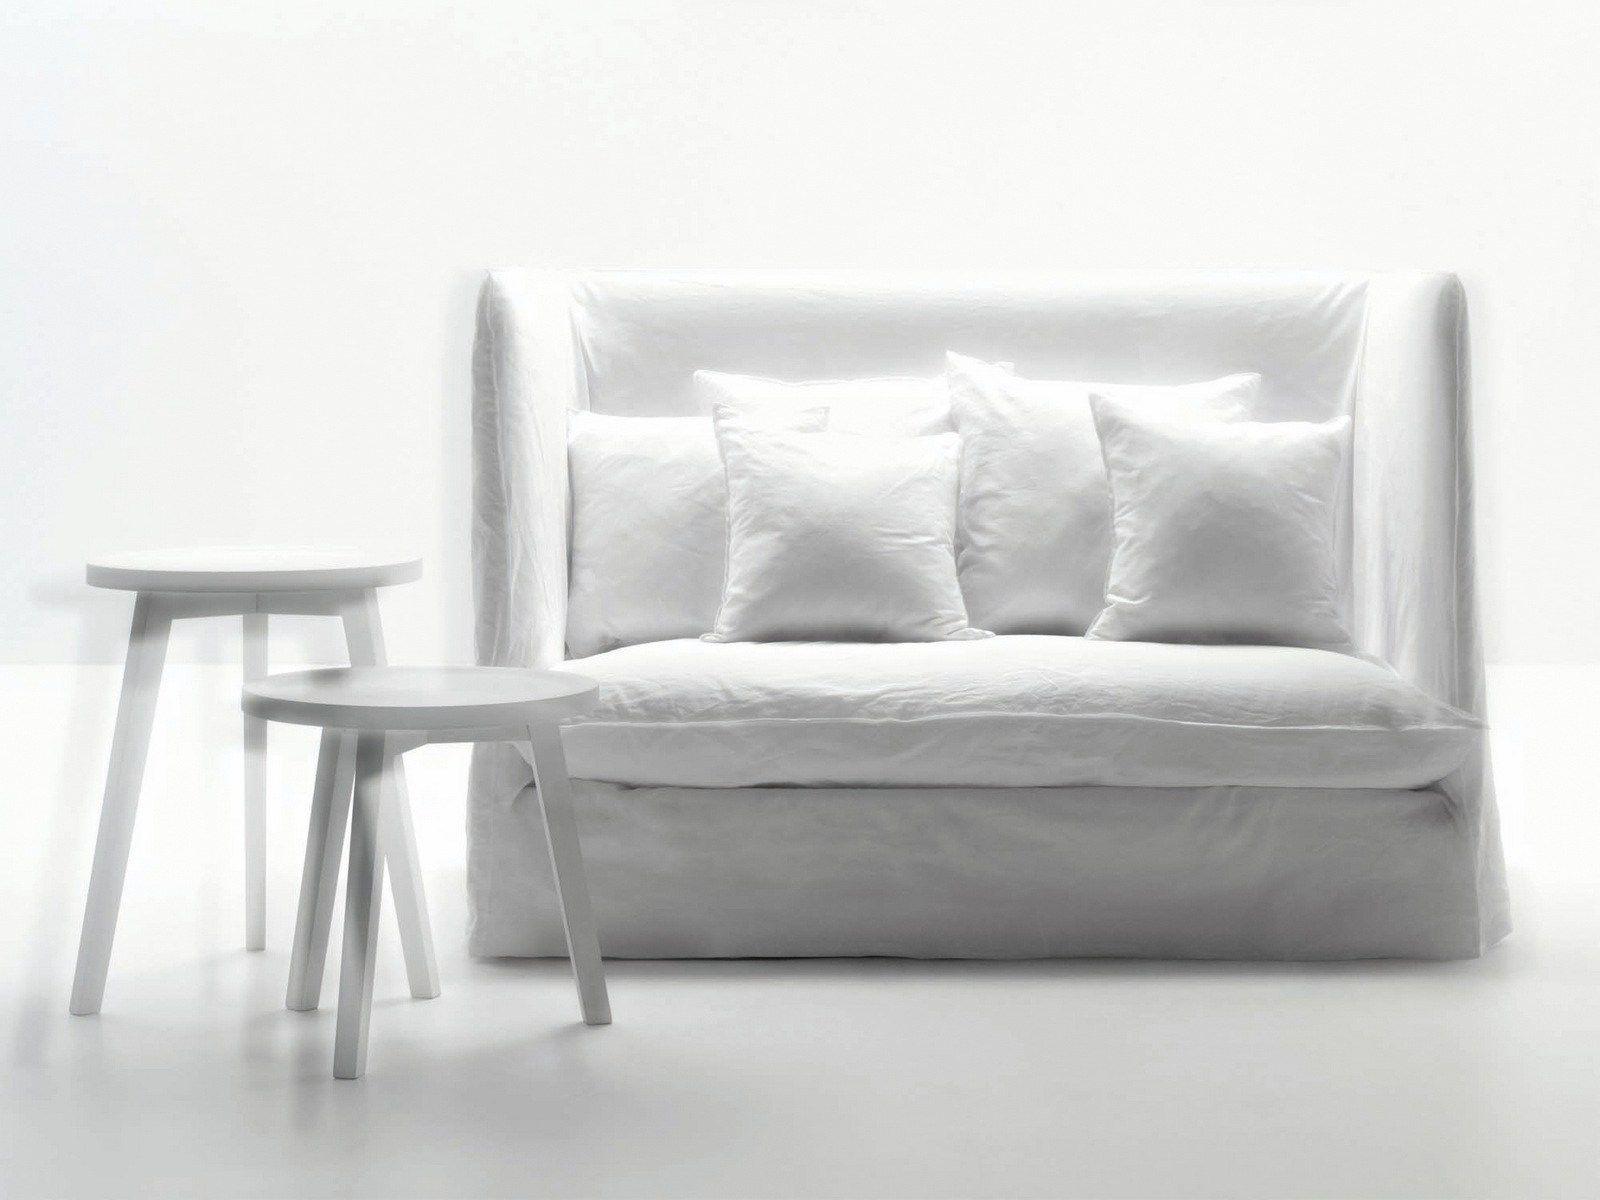 2 er sofa mit hoher r ckenlehne ghost 18 by gervasoni design paola navone. Black Bedroom Furniture Sets. Home Design Ideas